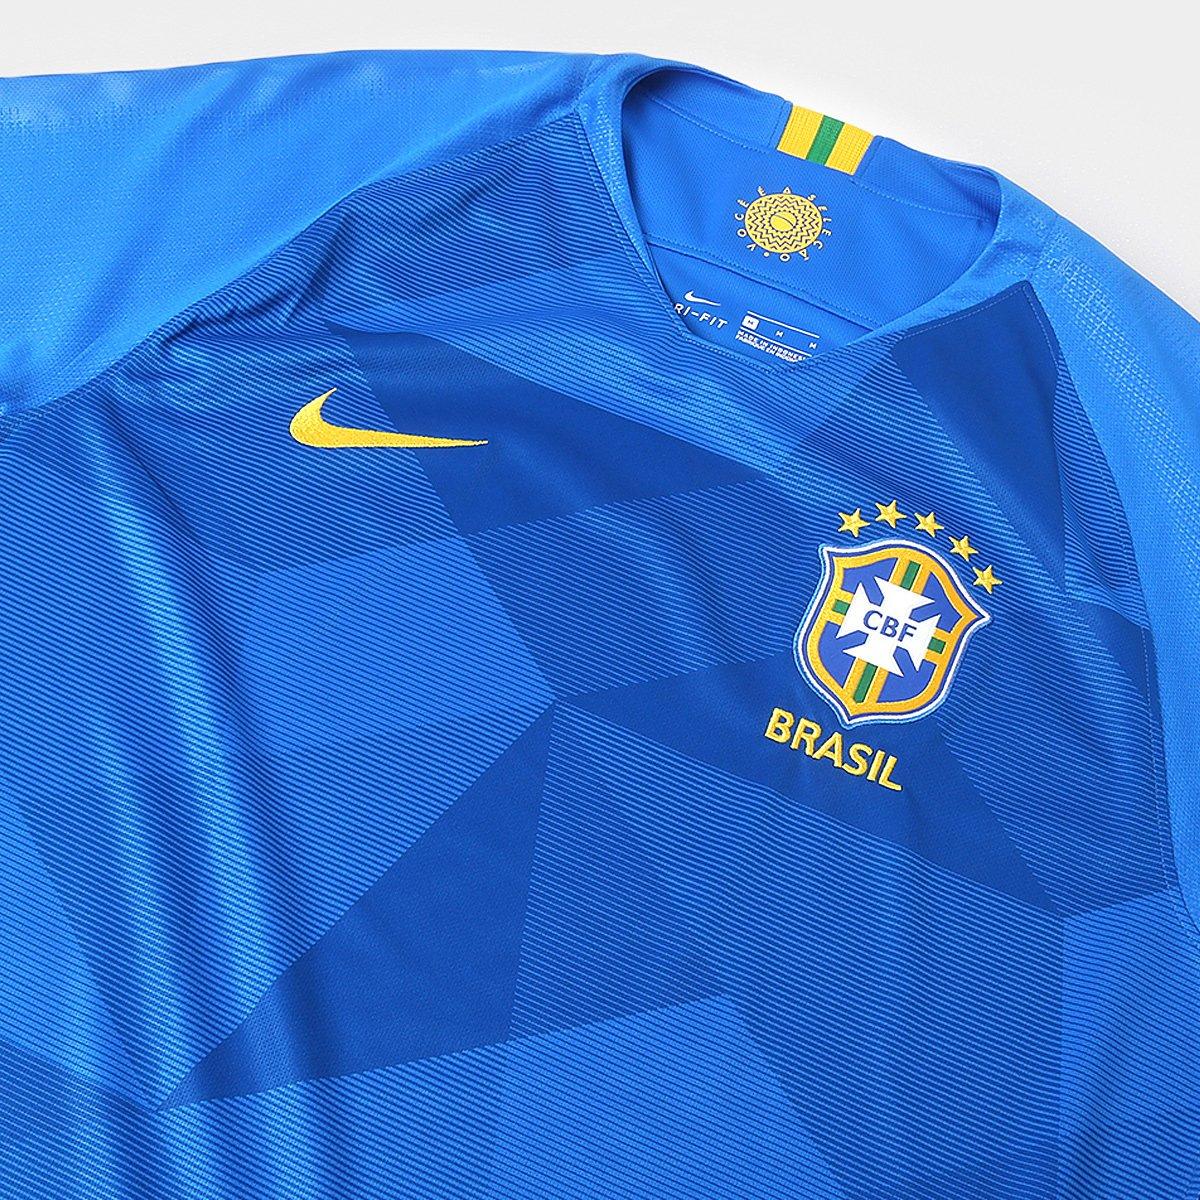 Camisa Seleção Brasil II 2018 nº 2 T. Silva - Torcedor Nike ... b029a955f4c27